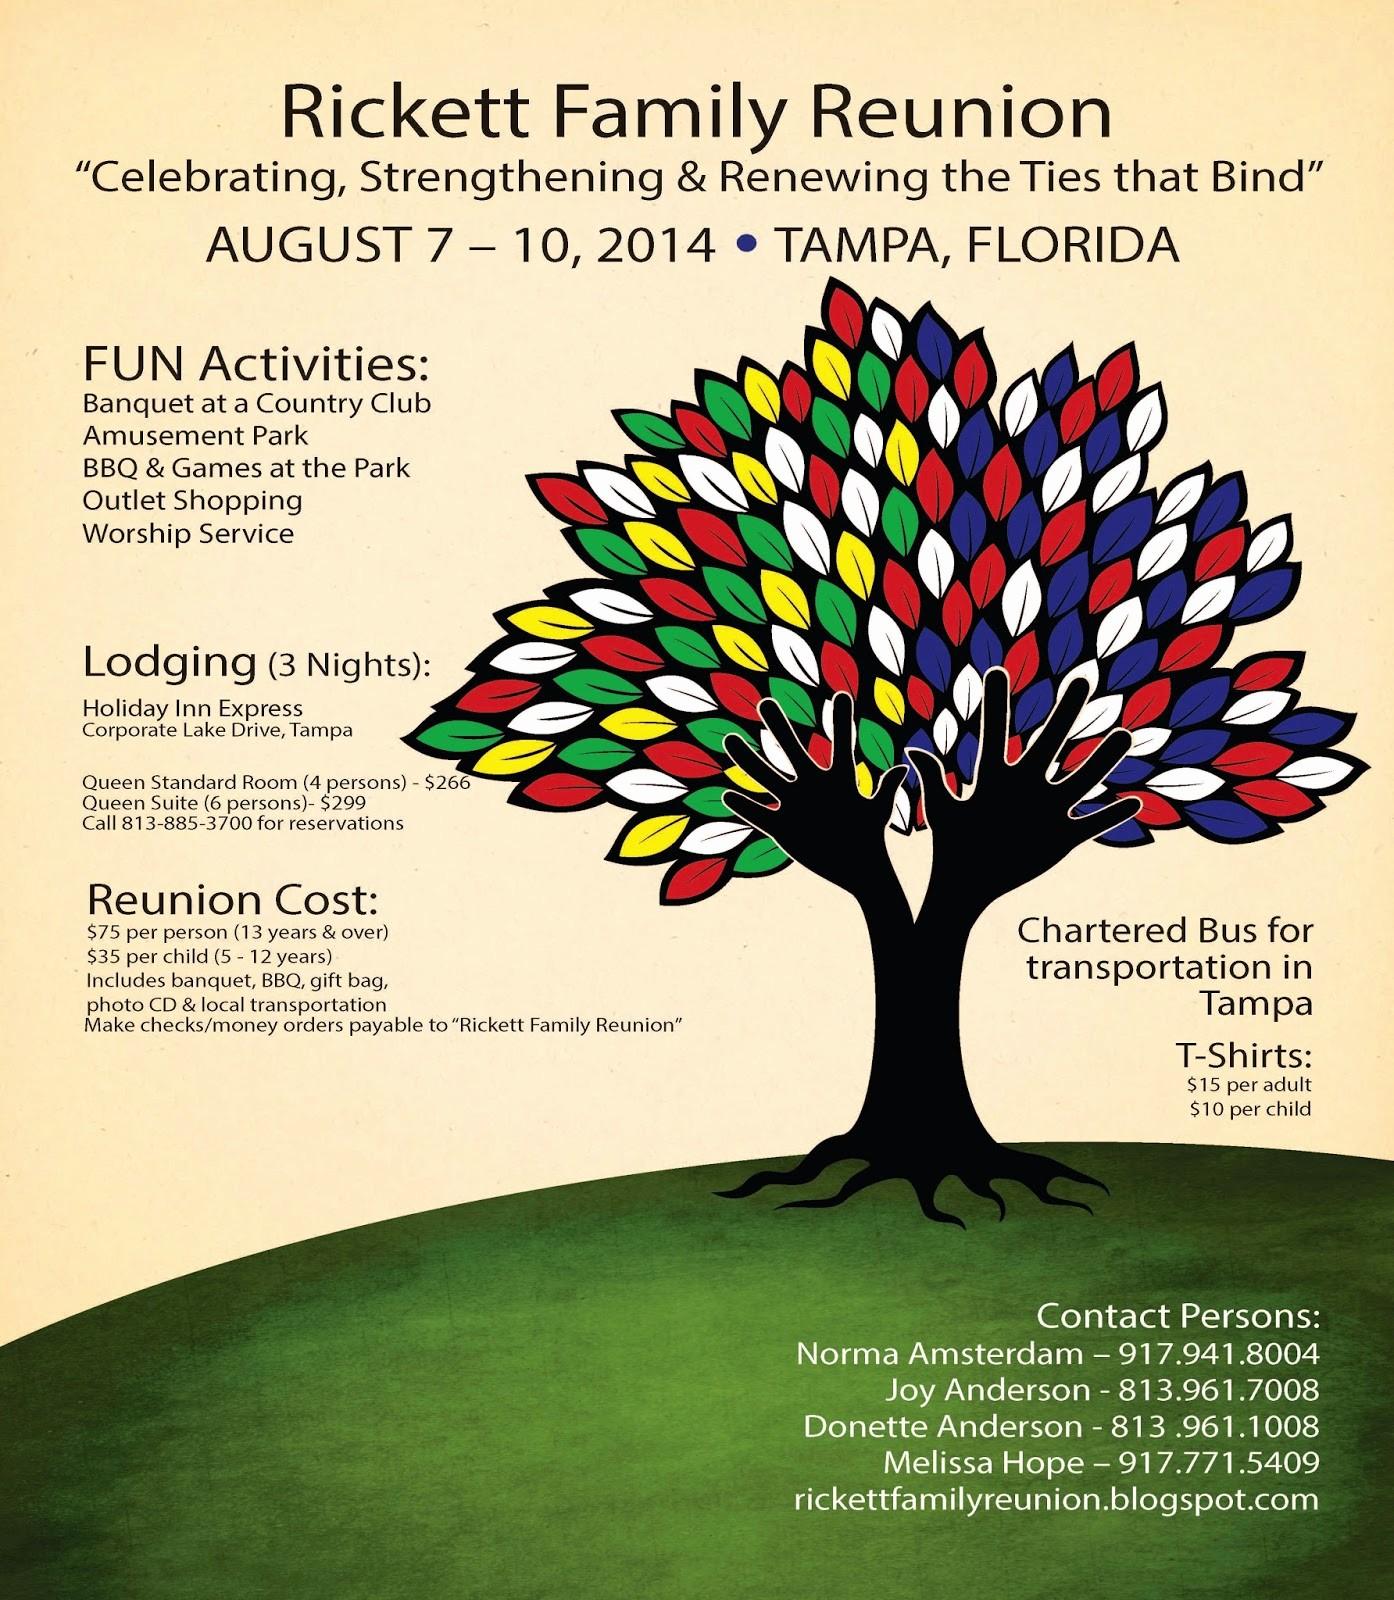 Family Reunion Flyer Templates Free Luxury Rickett Family Reunion Blog